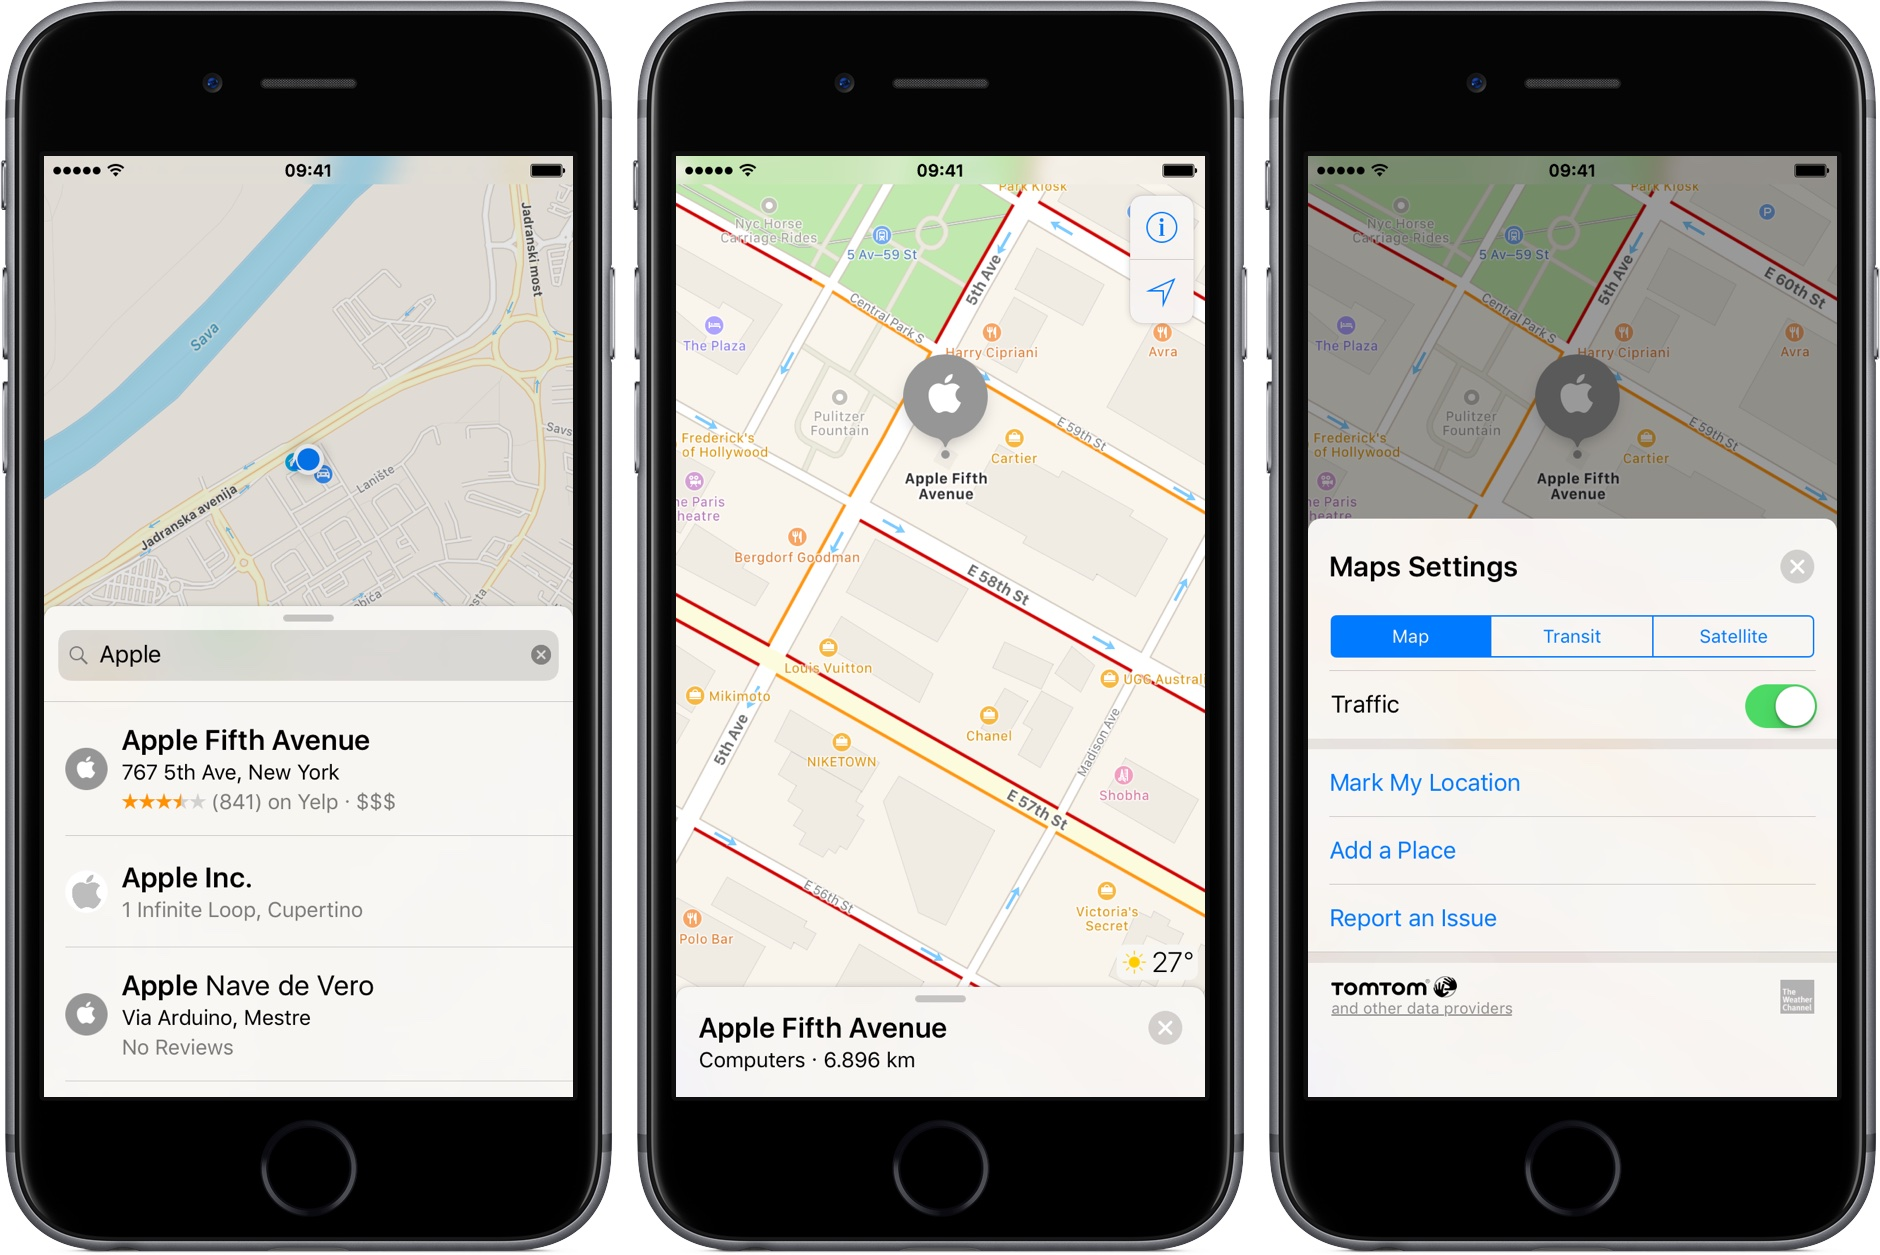 ios-10-maps-iphone-screenshot-002